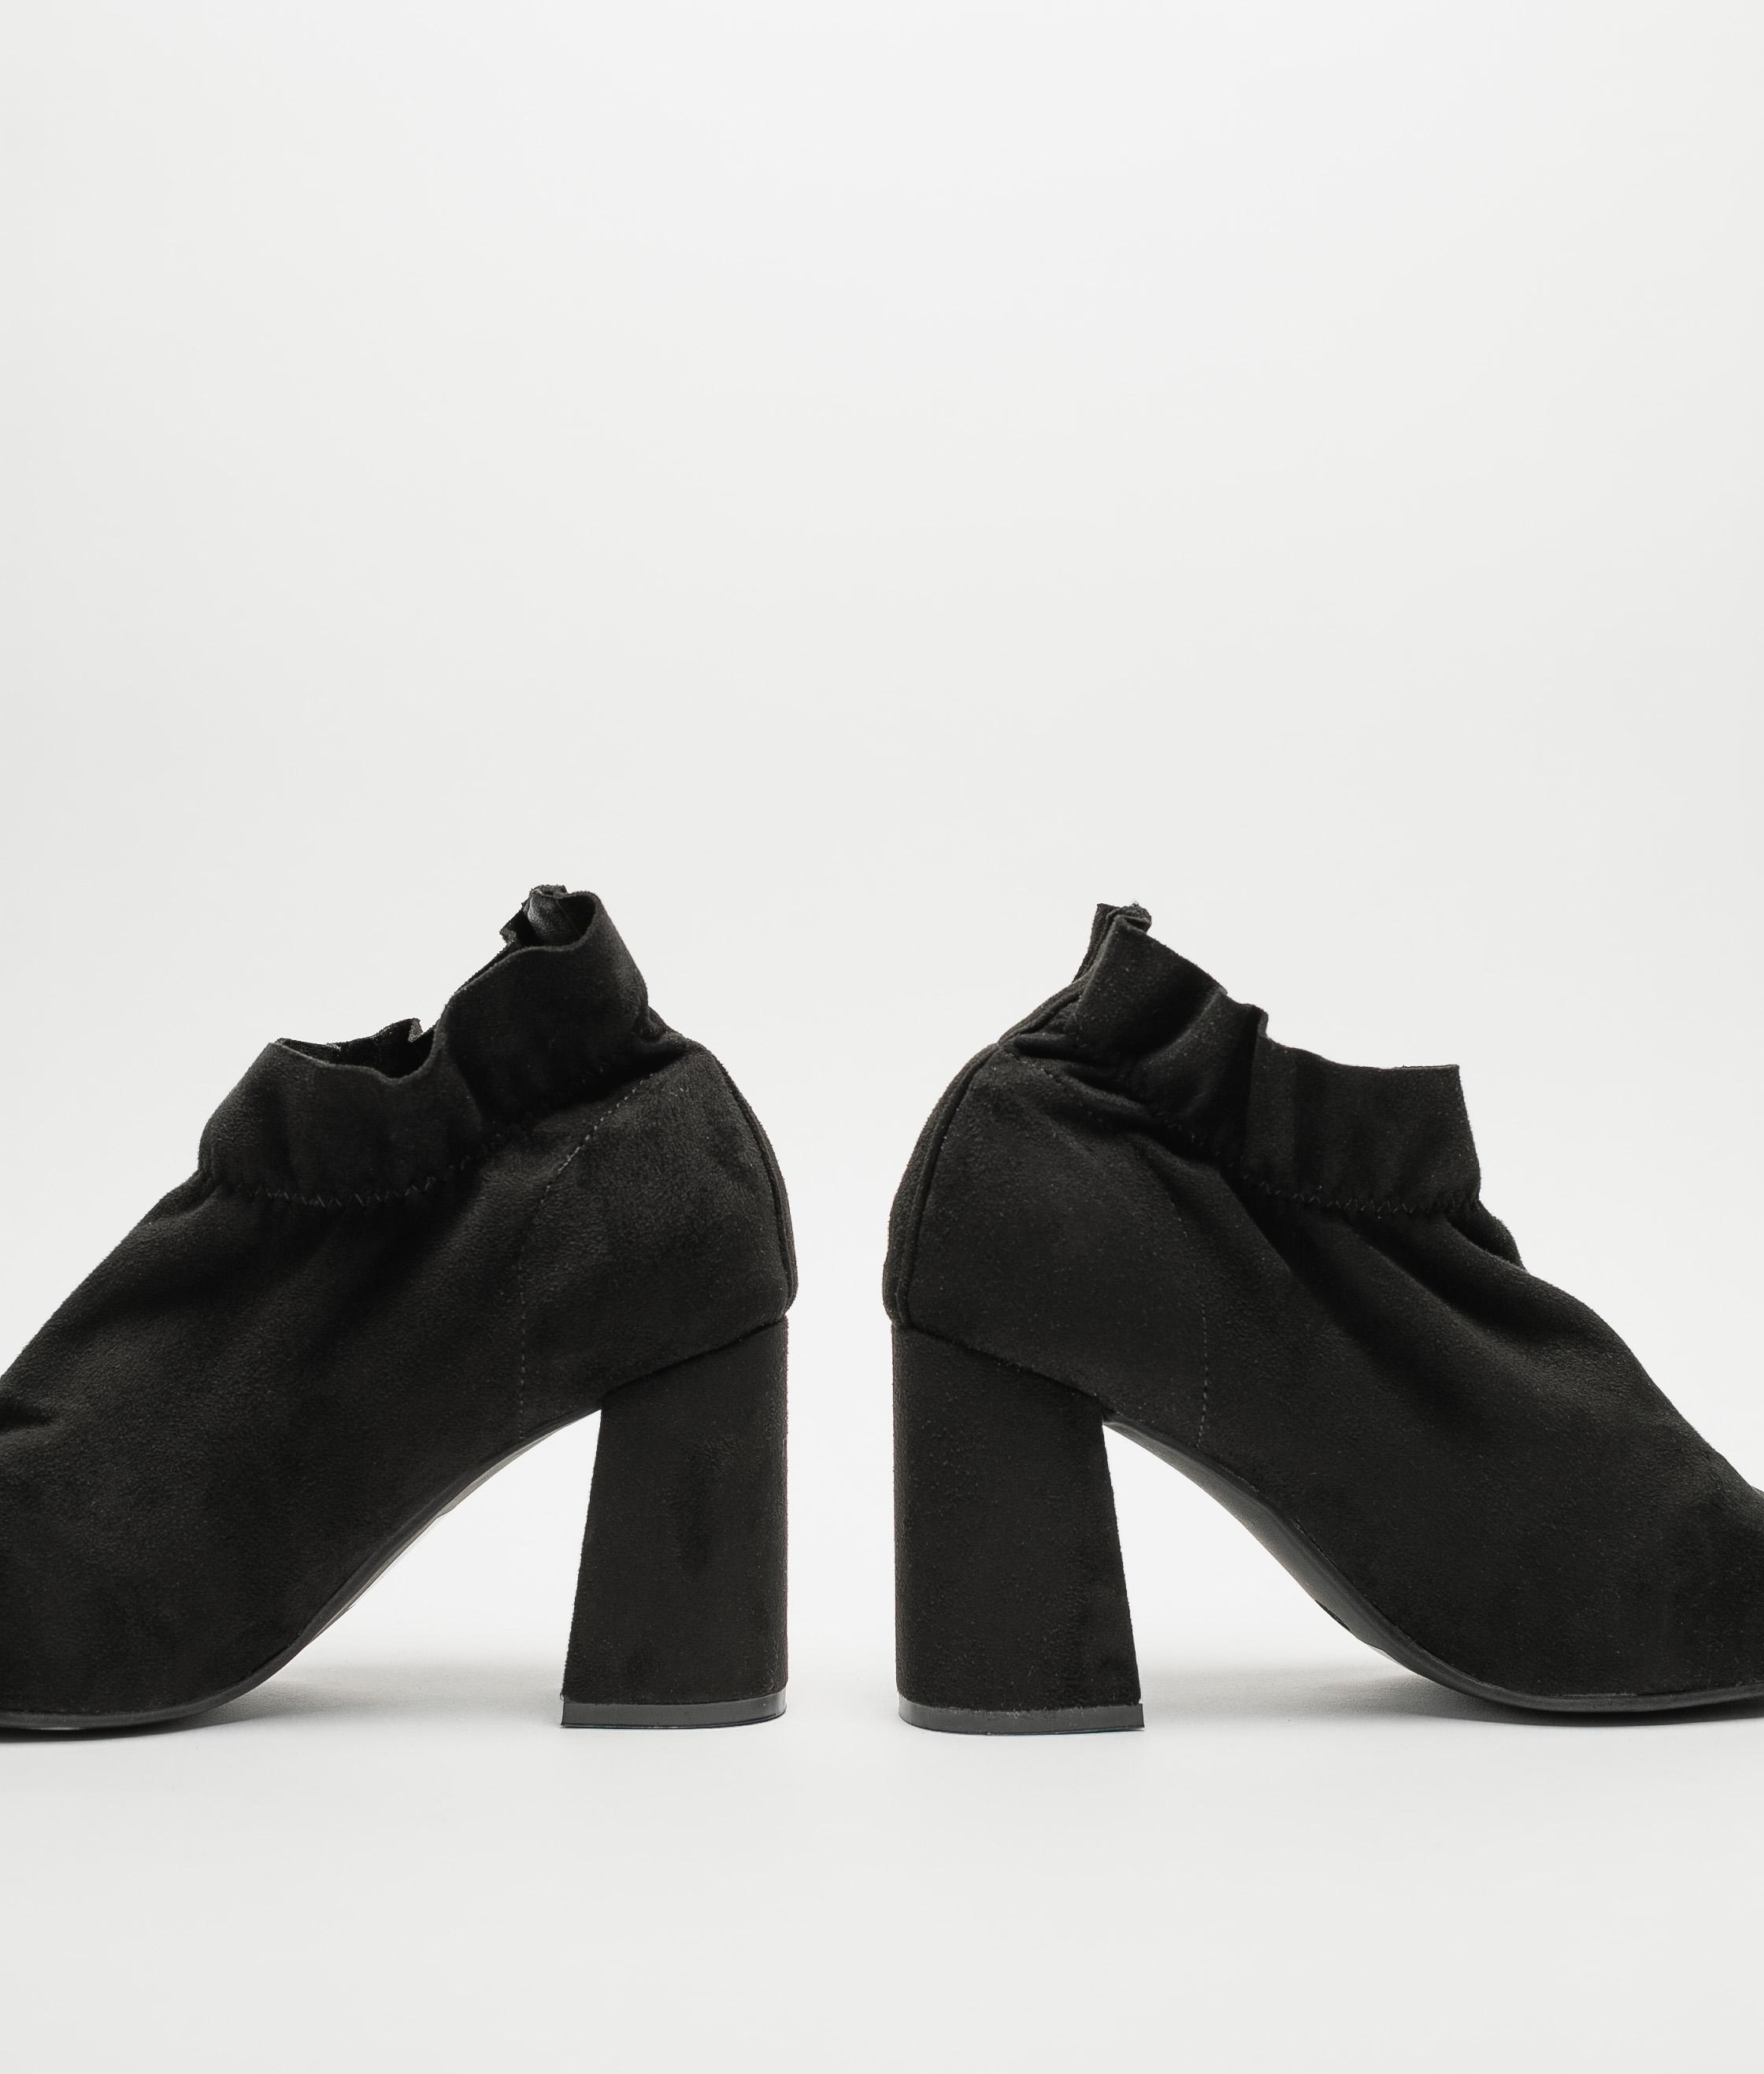 Bota baja Paulet - Noir